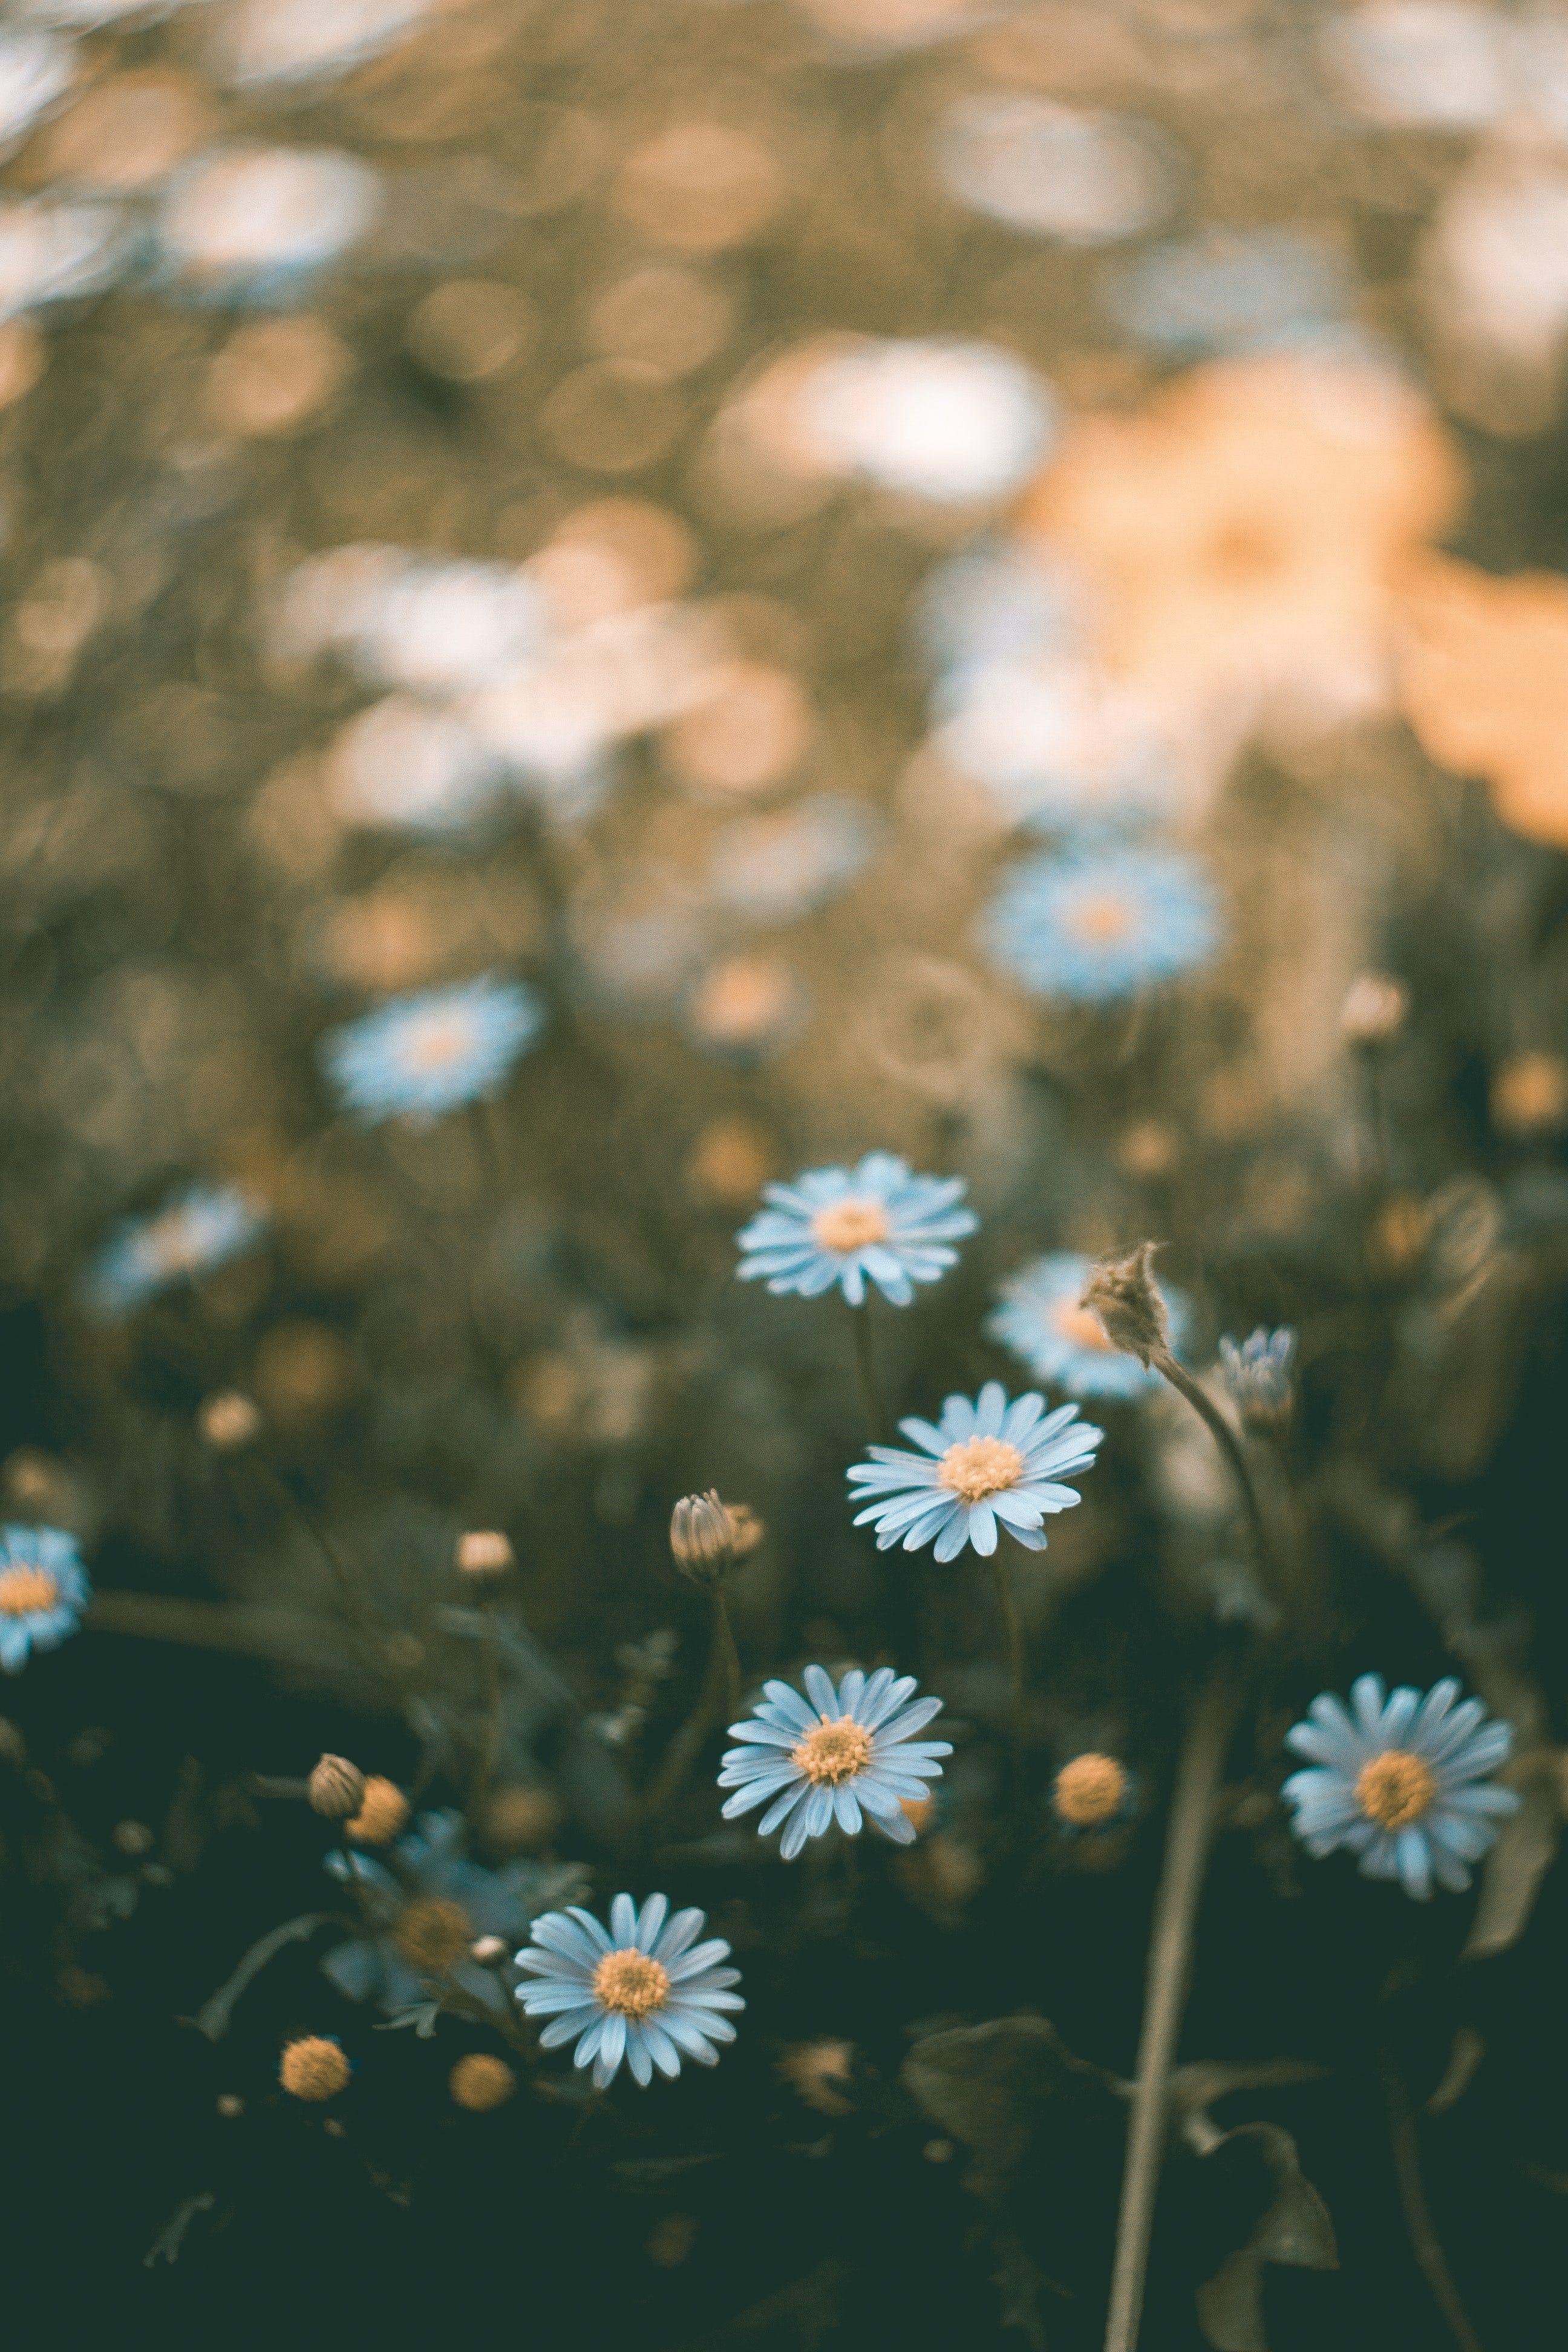 Flowers 100 Best Free Flower Petal Plant And Pink Photos On Unsplash Flower Iphone Wallpaper Pretty Flowers Background Beautiful Flowers